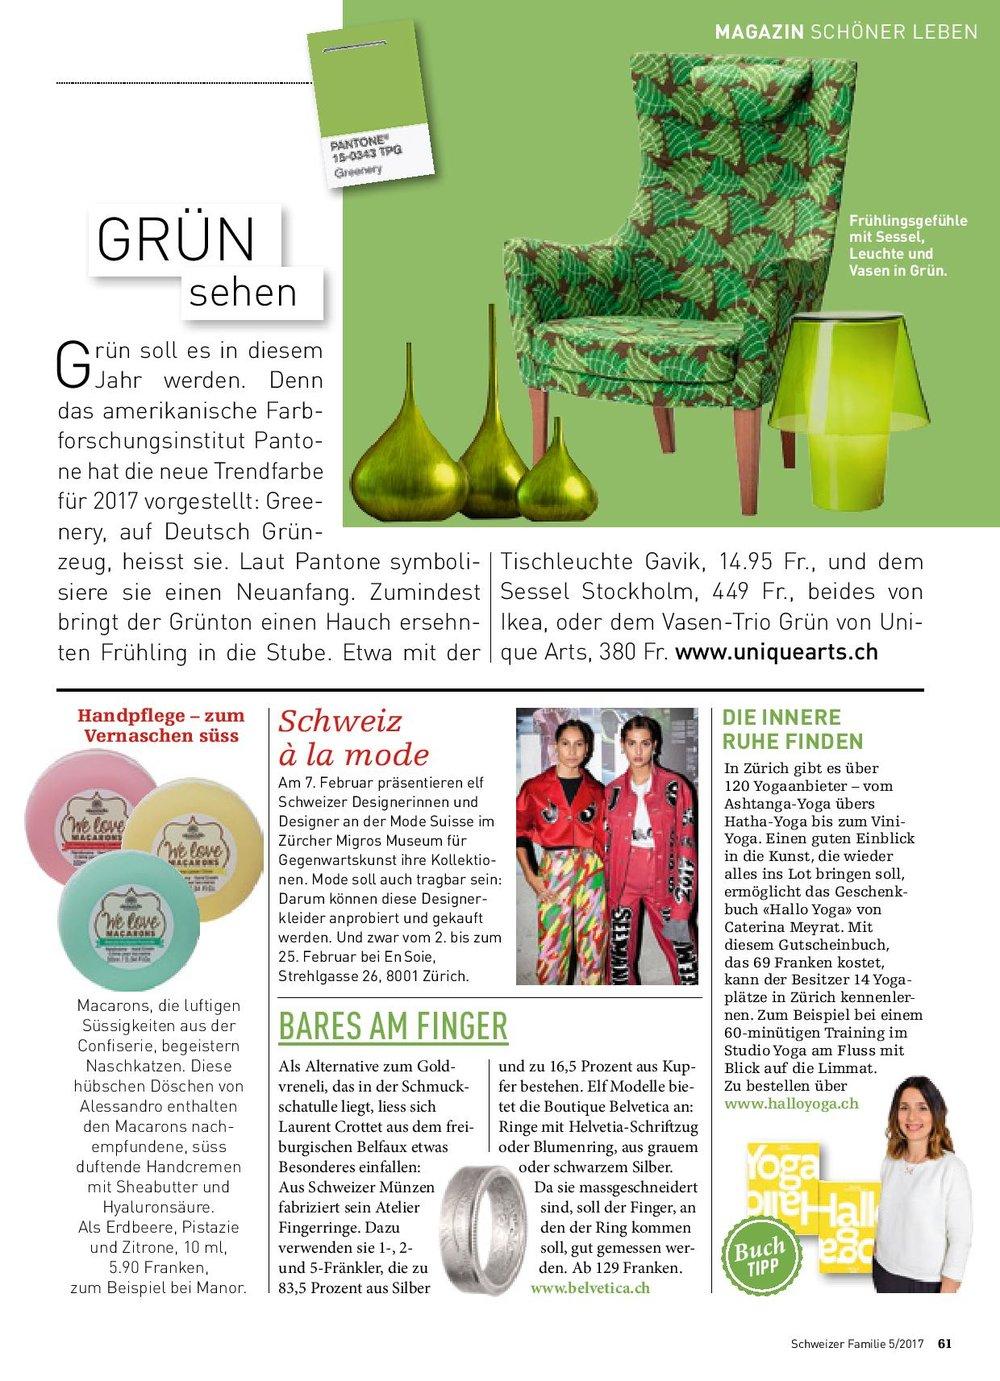 Schweizer Familie_010217_SFA1705_061_sle_magazin2-page-001.jpg